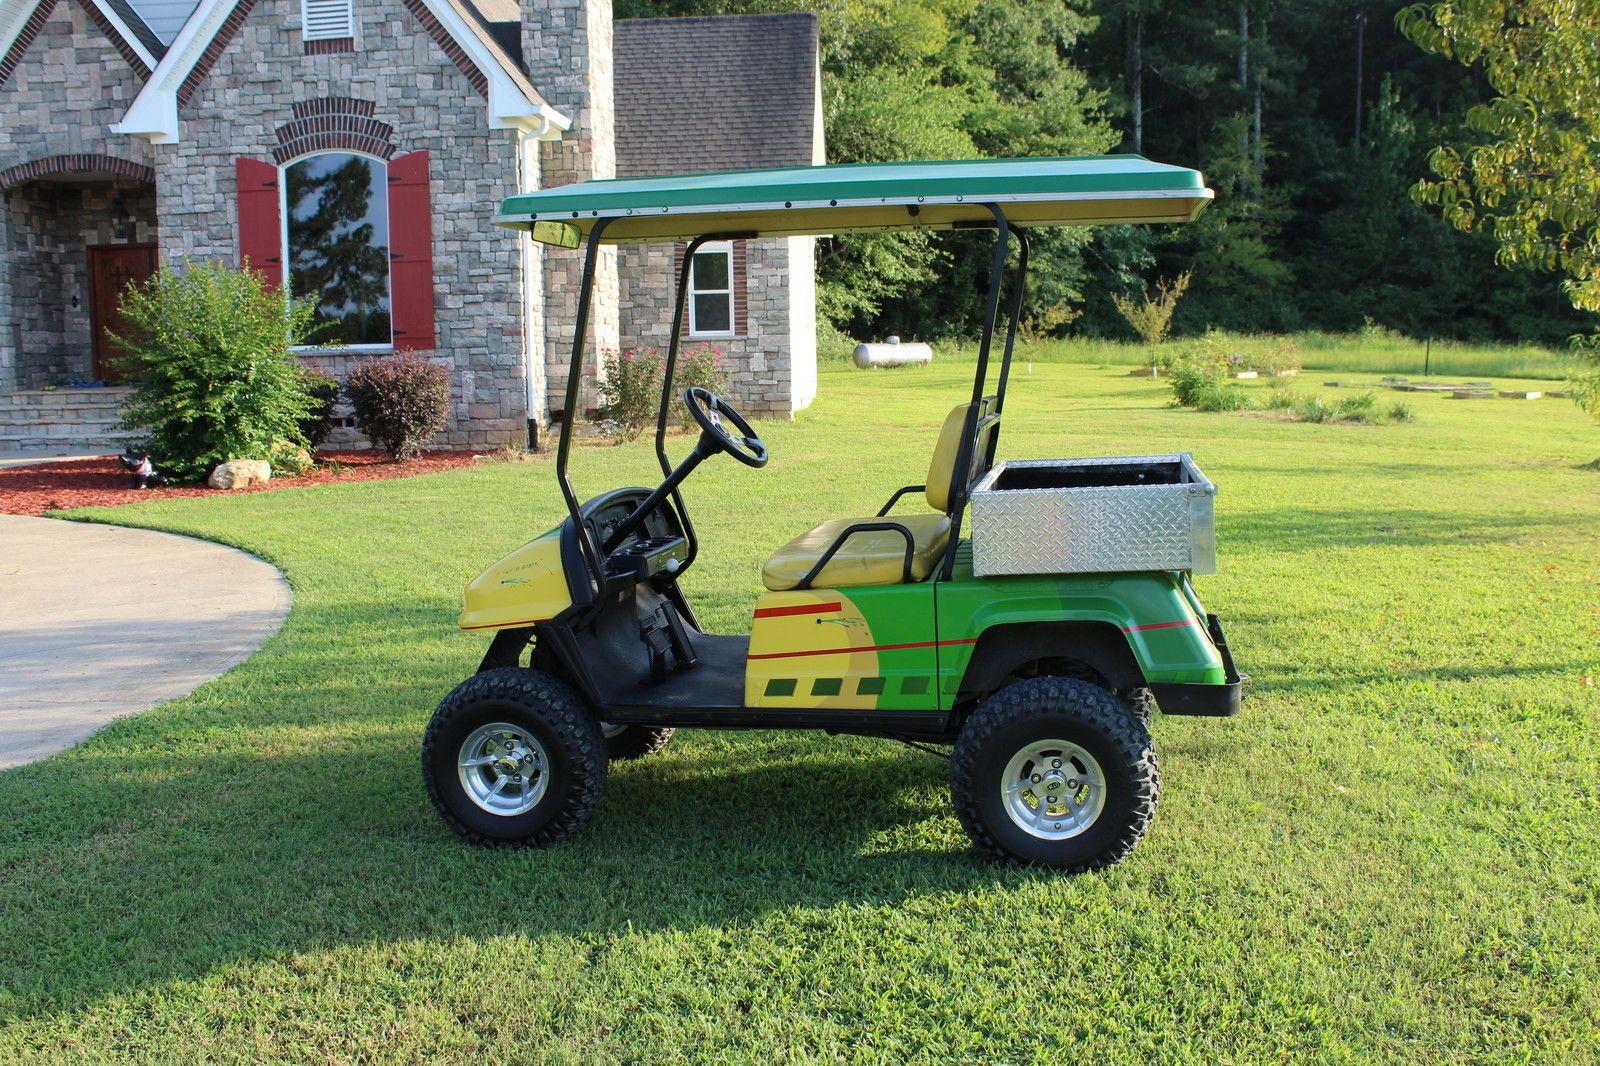 columbia par car ezgo gas golf cart golf carts for sale. Black Bedroom Furniture Sets. Home Design Ideas